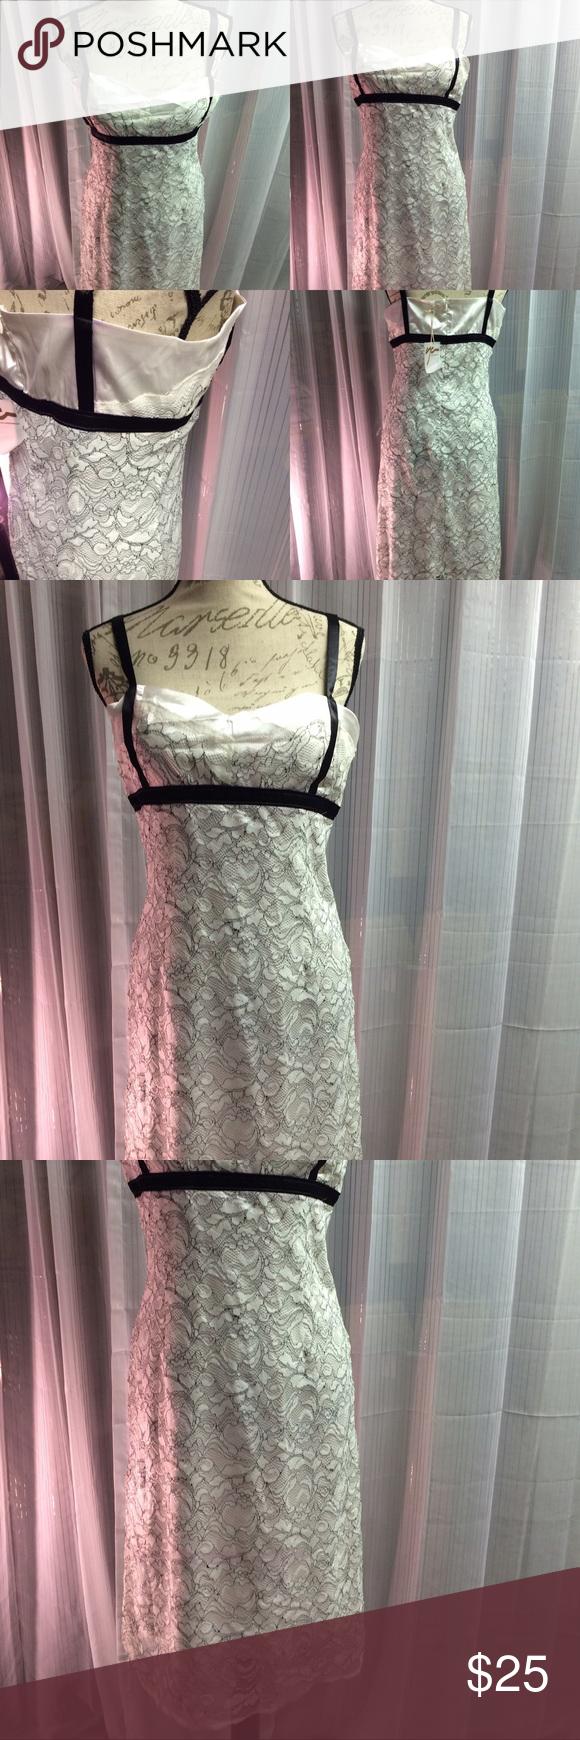 Lace detail cocktail dress Beautiful dress. Adjustable straps. Never worn. ya Dresses Midi